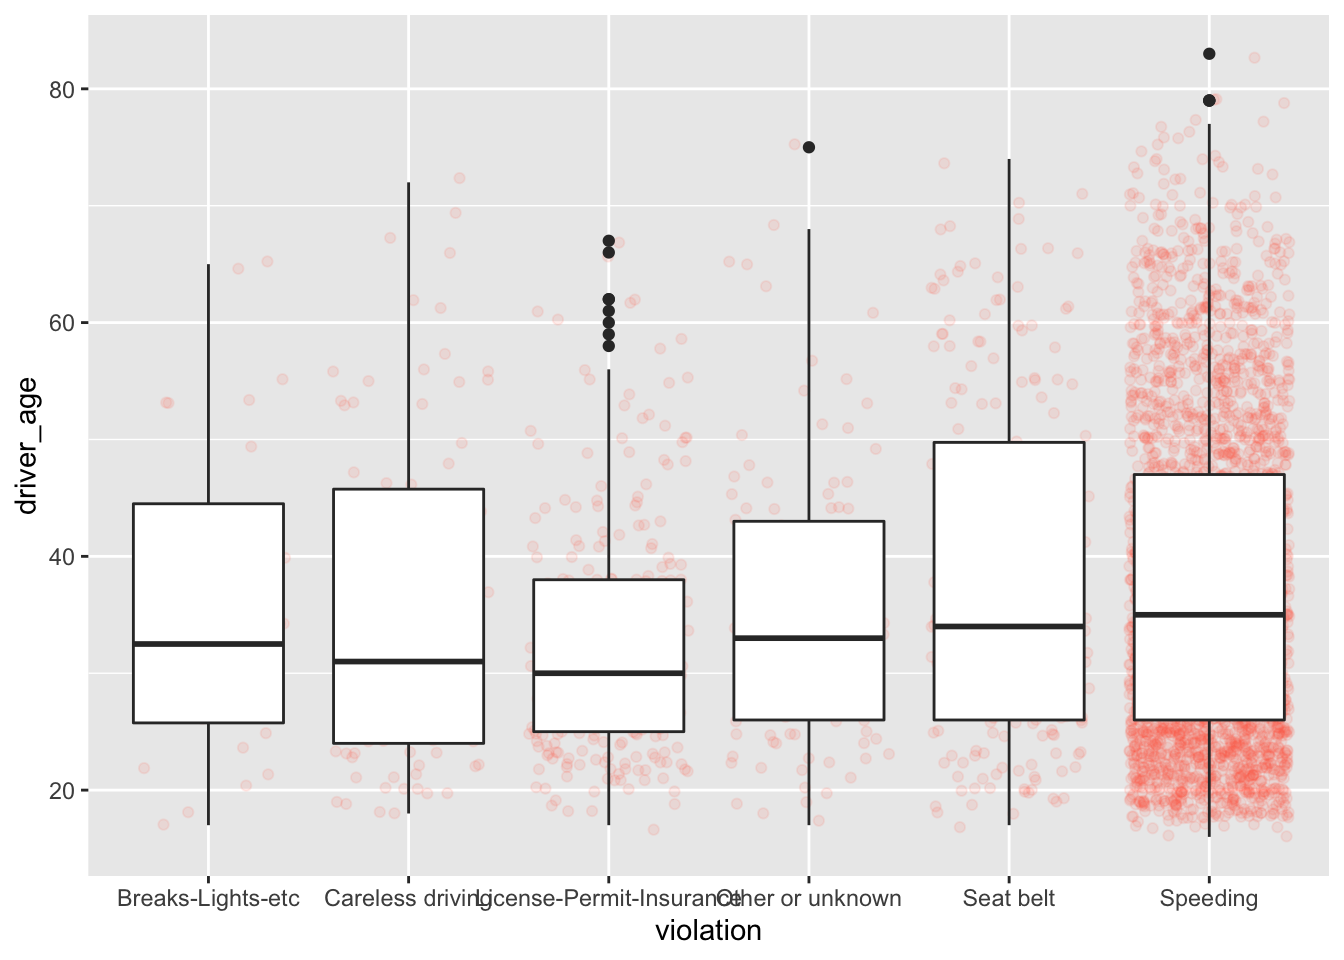 Chapter 3 Data Visualization with ggplot2   Data Wrangling